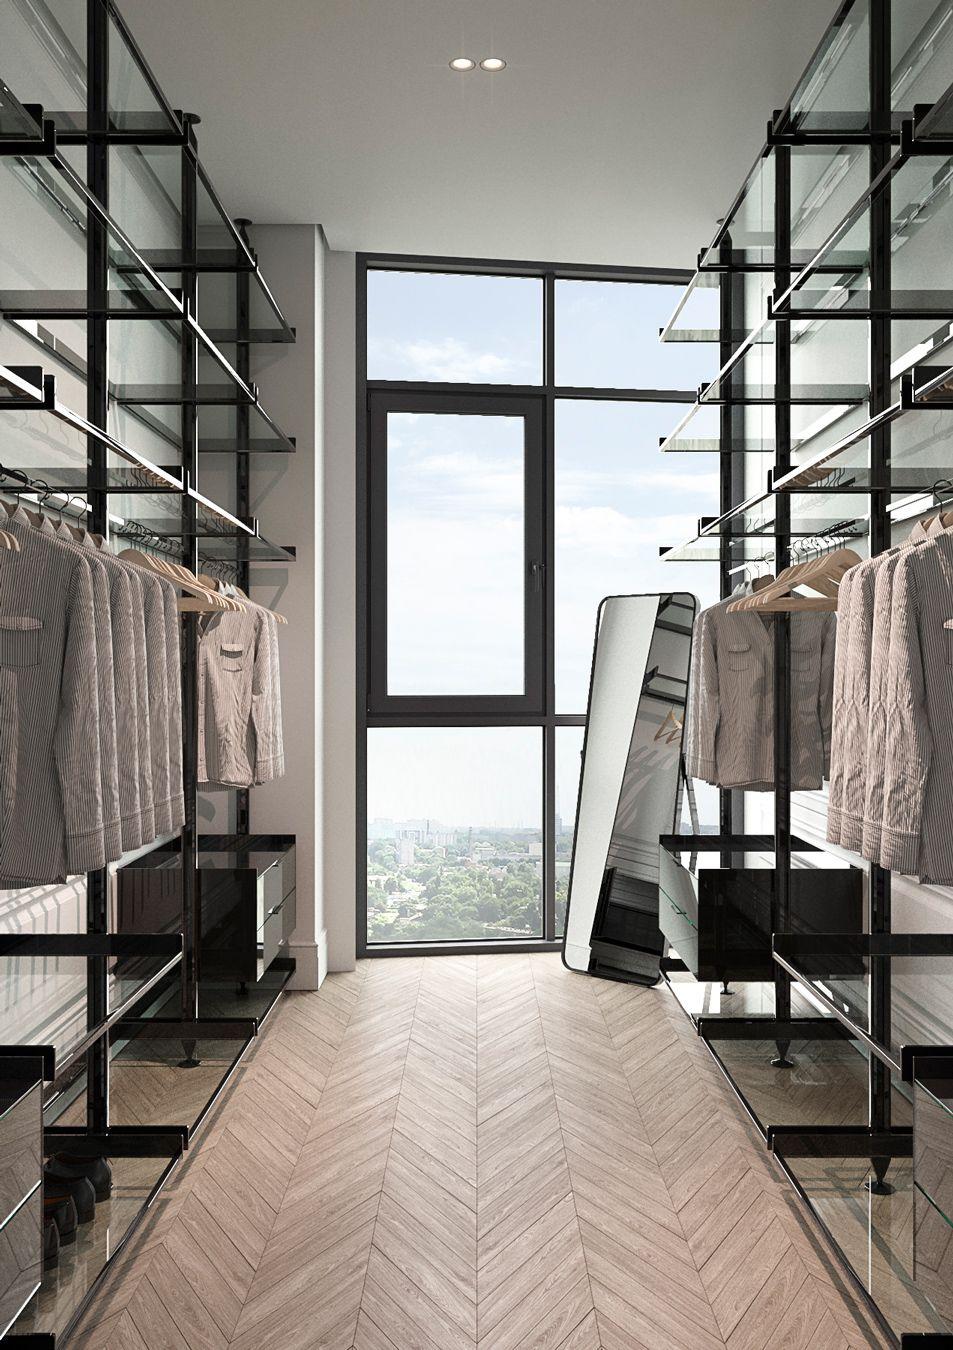 Penthouse on Behance | Modern luxury bedroom, Master ...